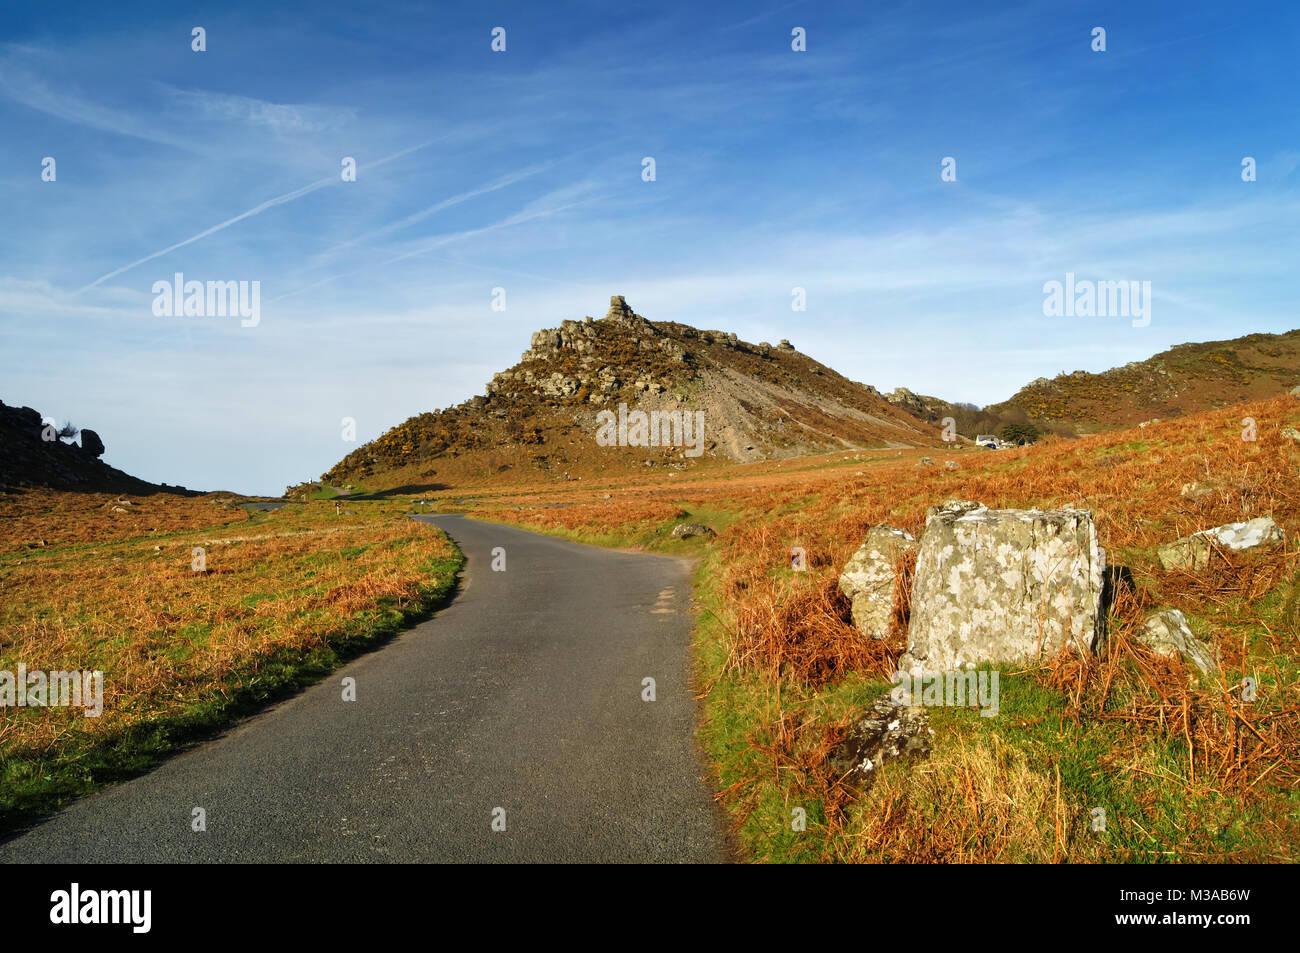 UK,North Devon,Exmoor,Valley of the Rocks,Looking towards Ragged Jack - Stock Image